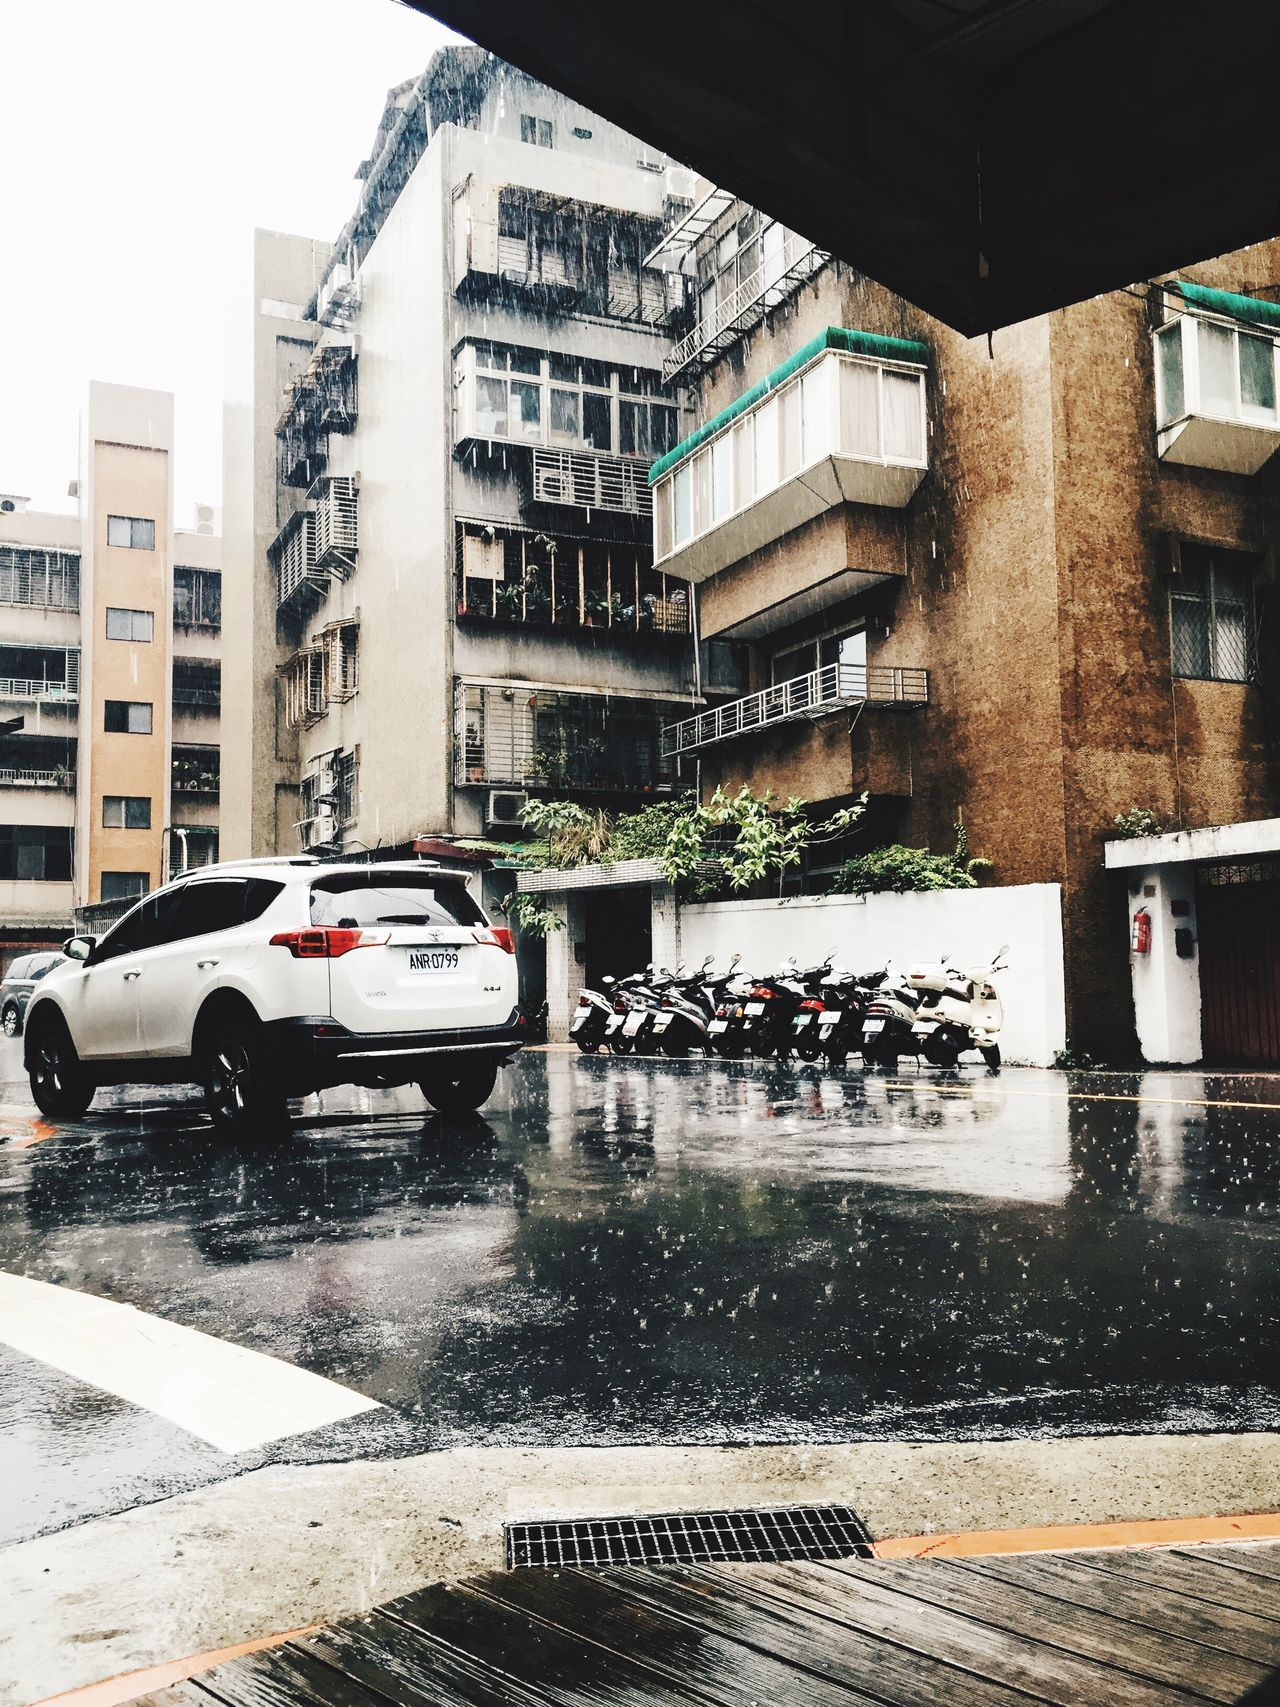 Rain Raindrops Rainy Days Gloomy Weather Taiwan Taipei Trip Photo